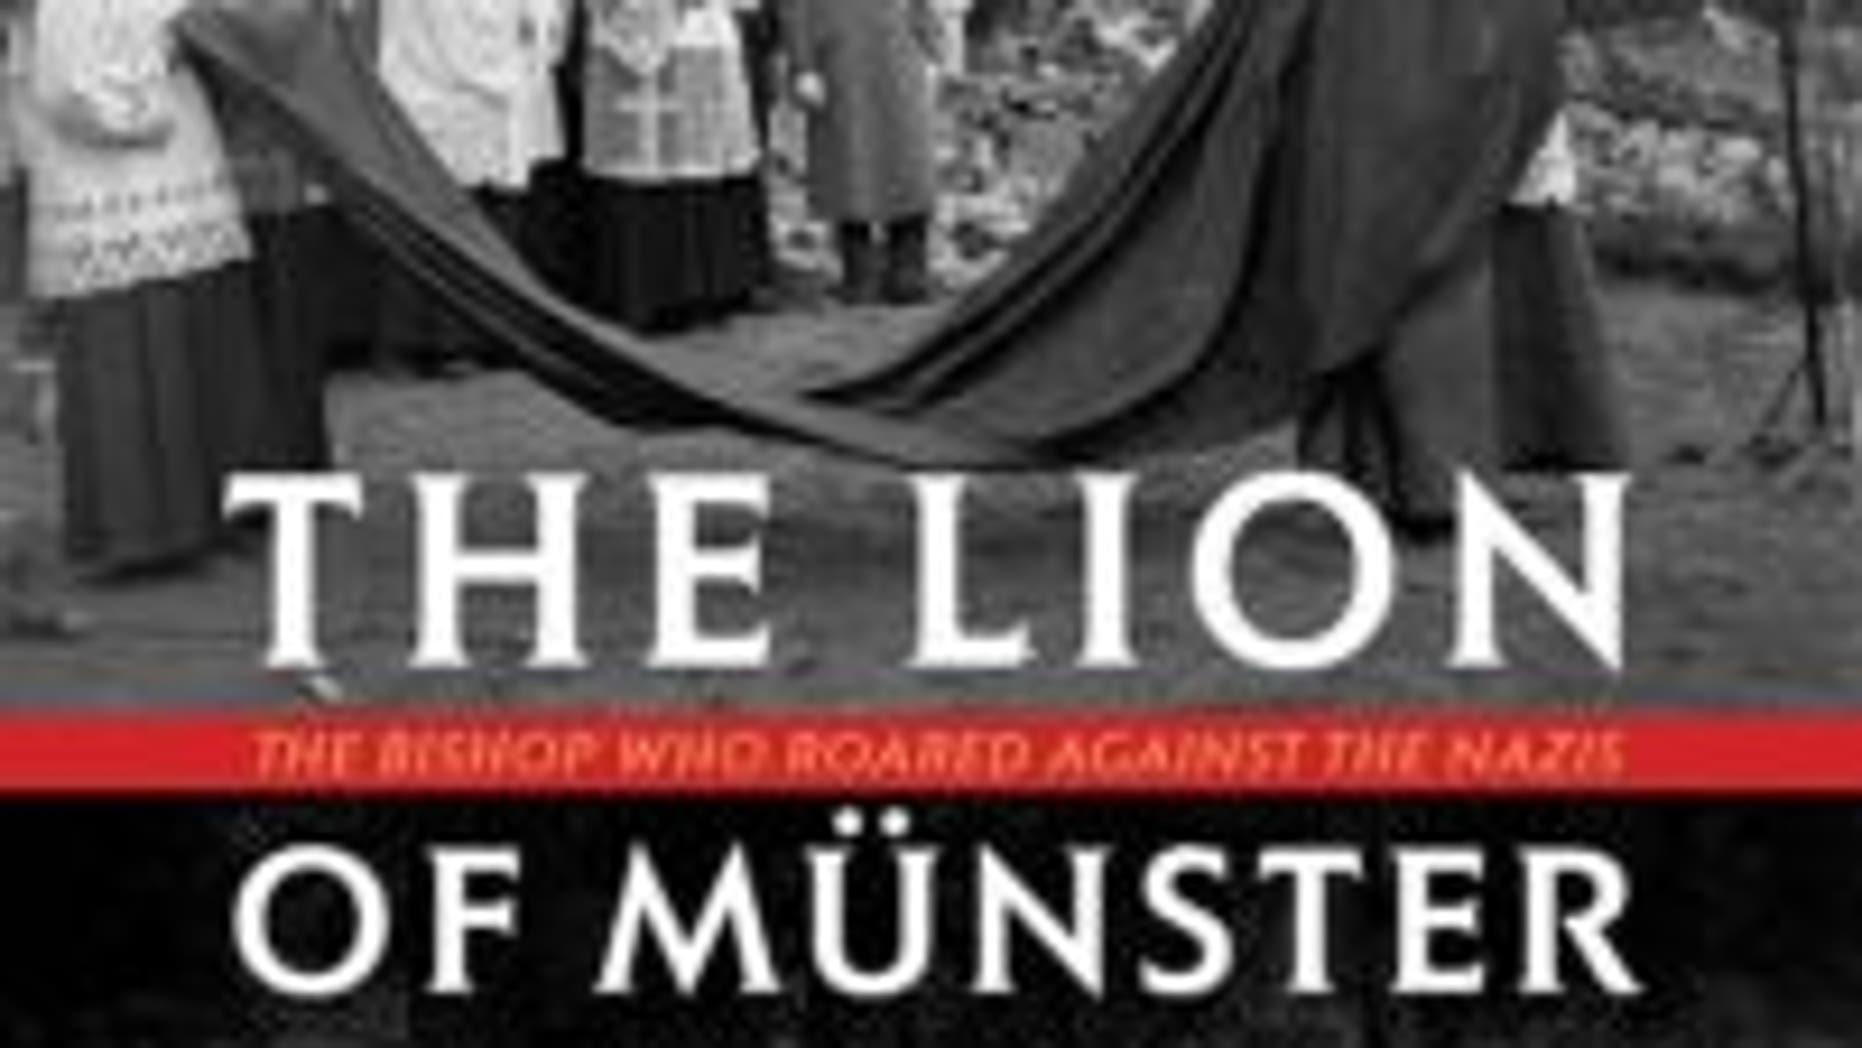 Father Daniel Utrech has written a book on the faith leader.